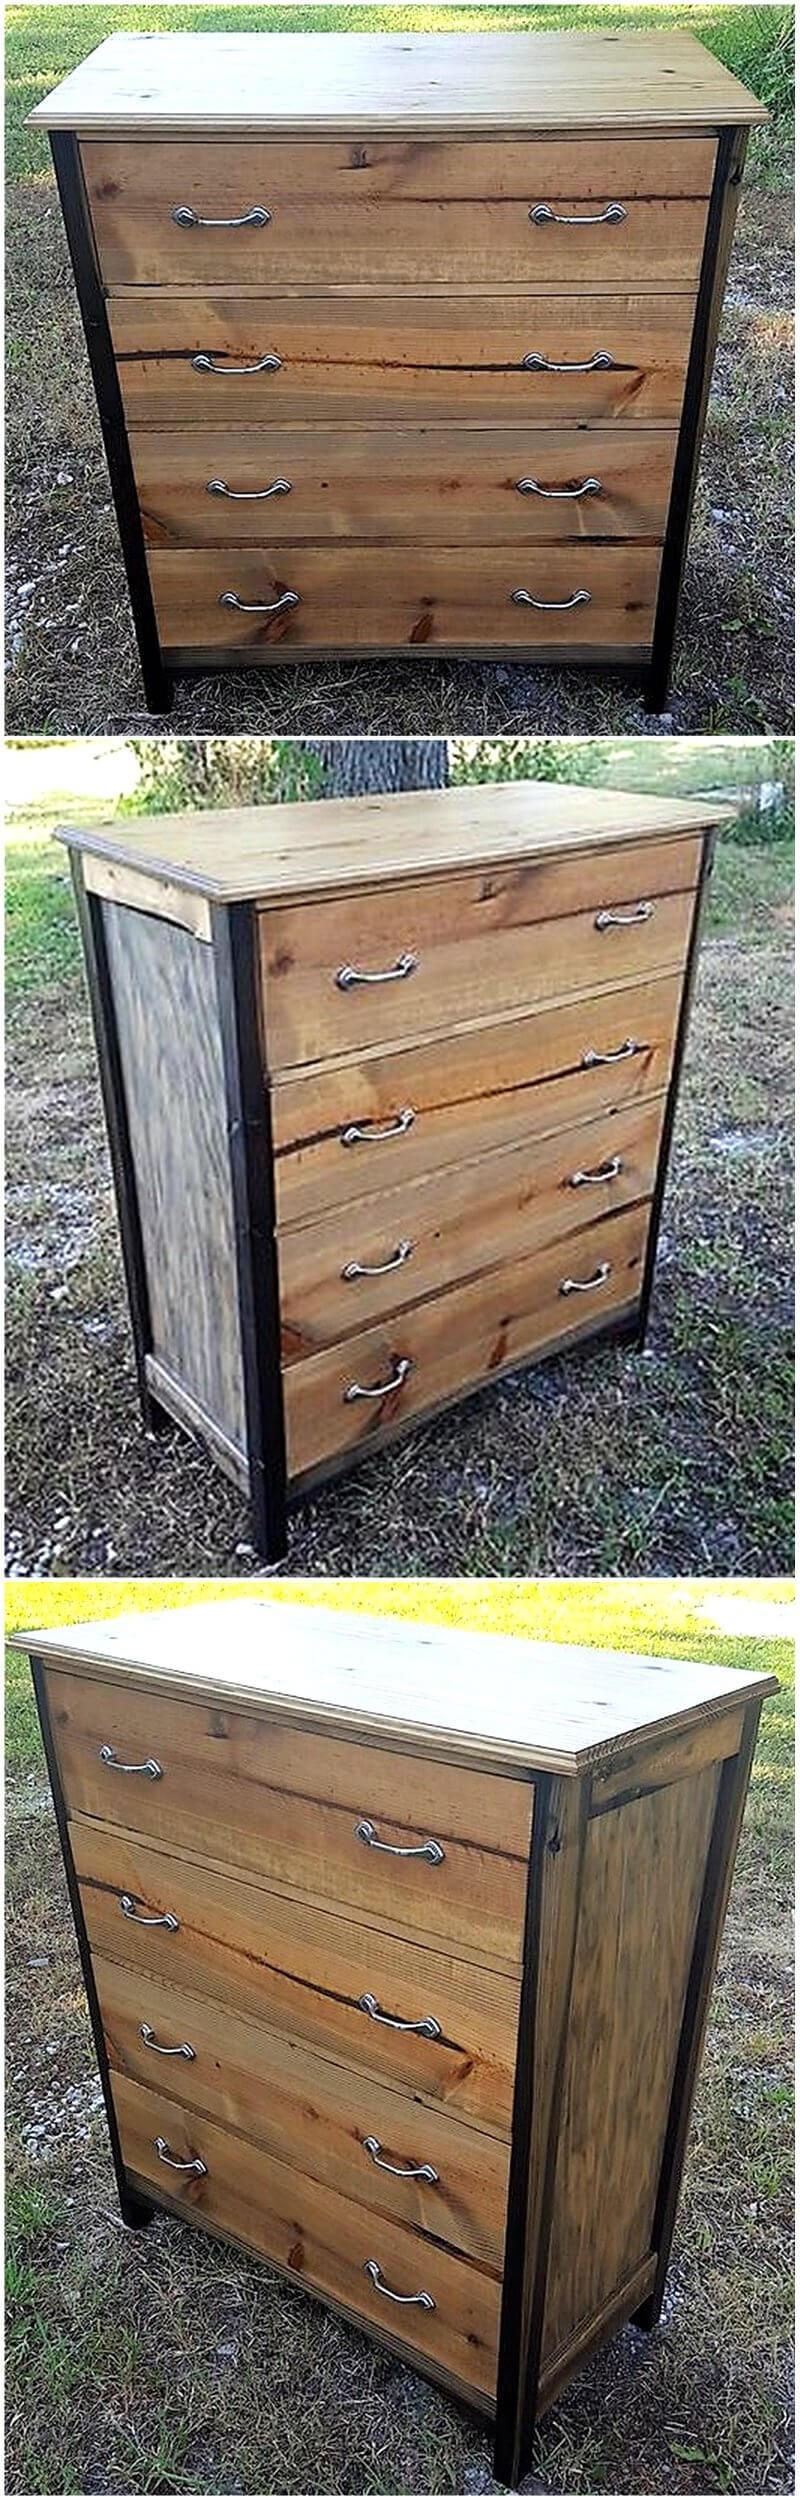 wood pallets repurposed dresser